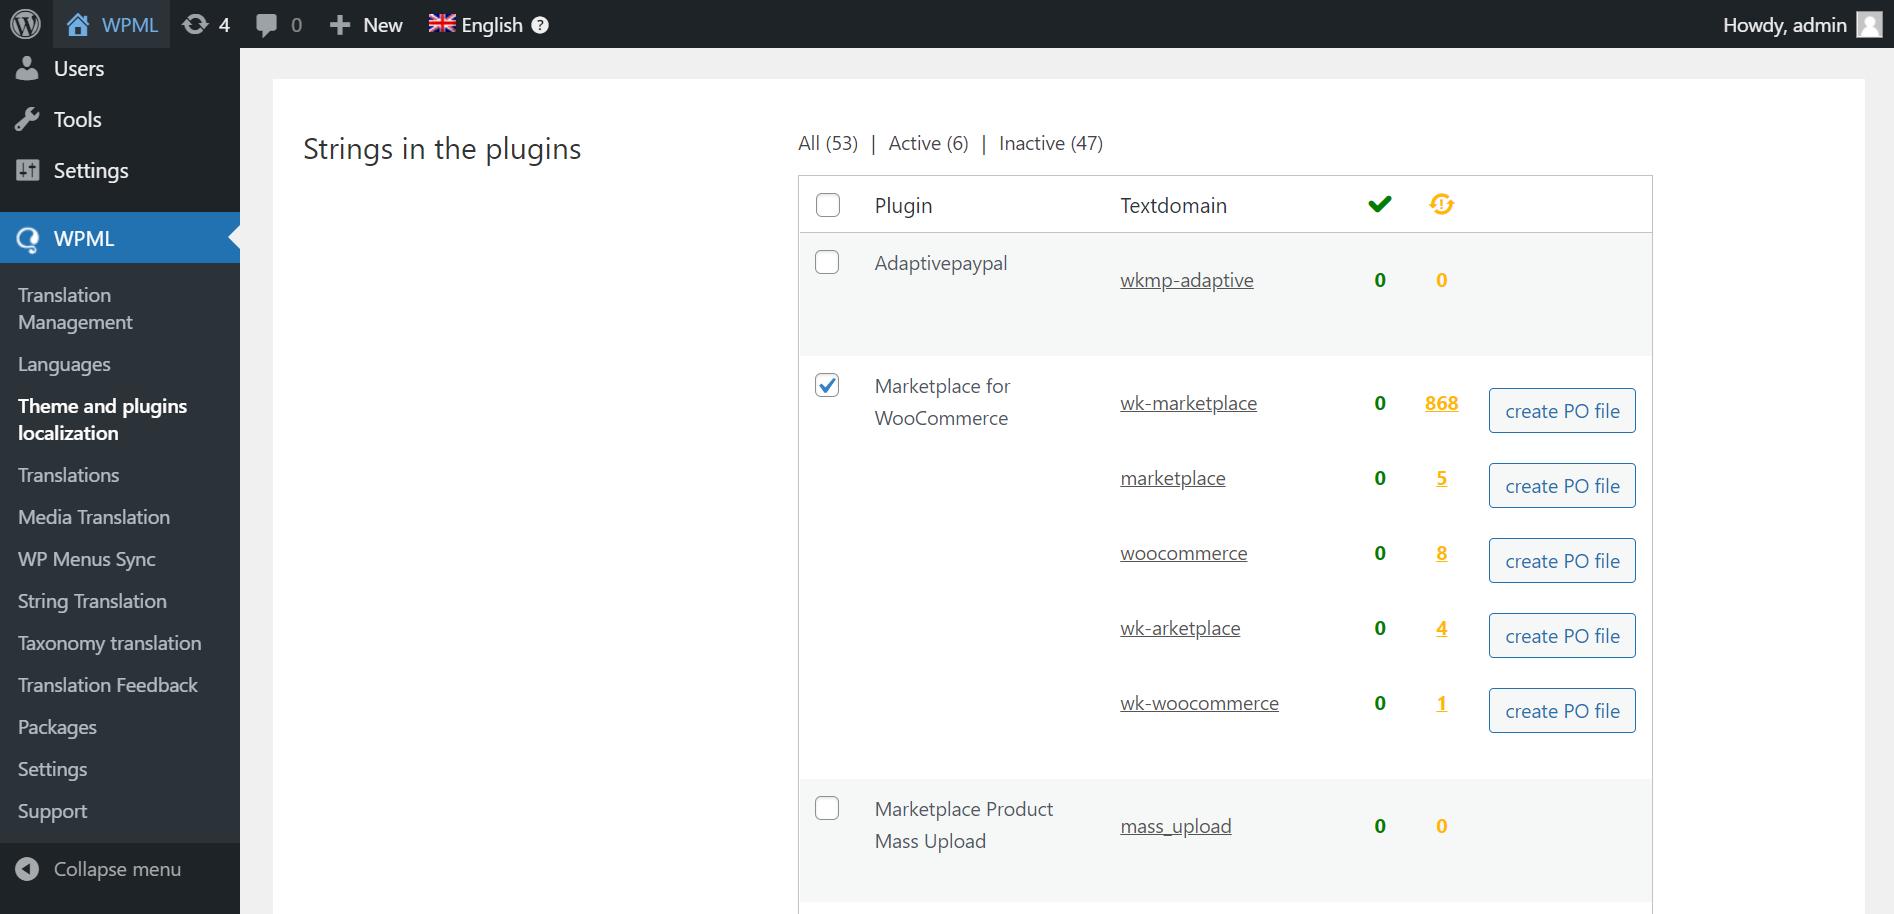 Theme-and-plugins-localization-WPML